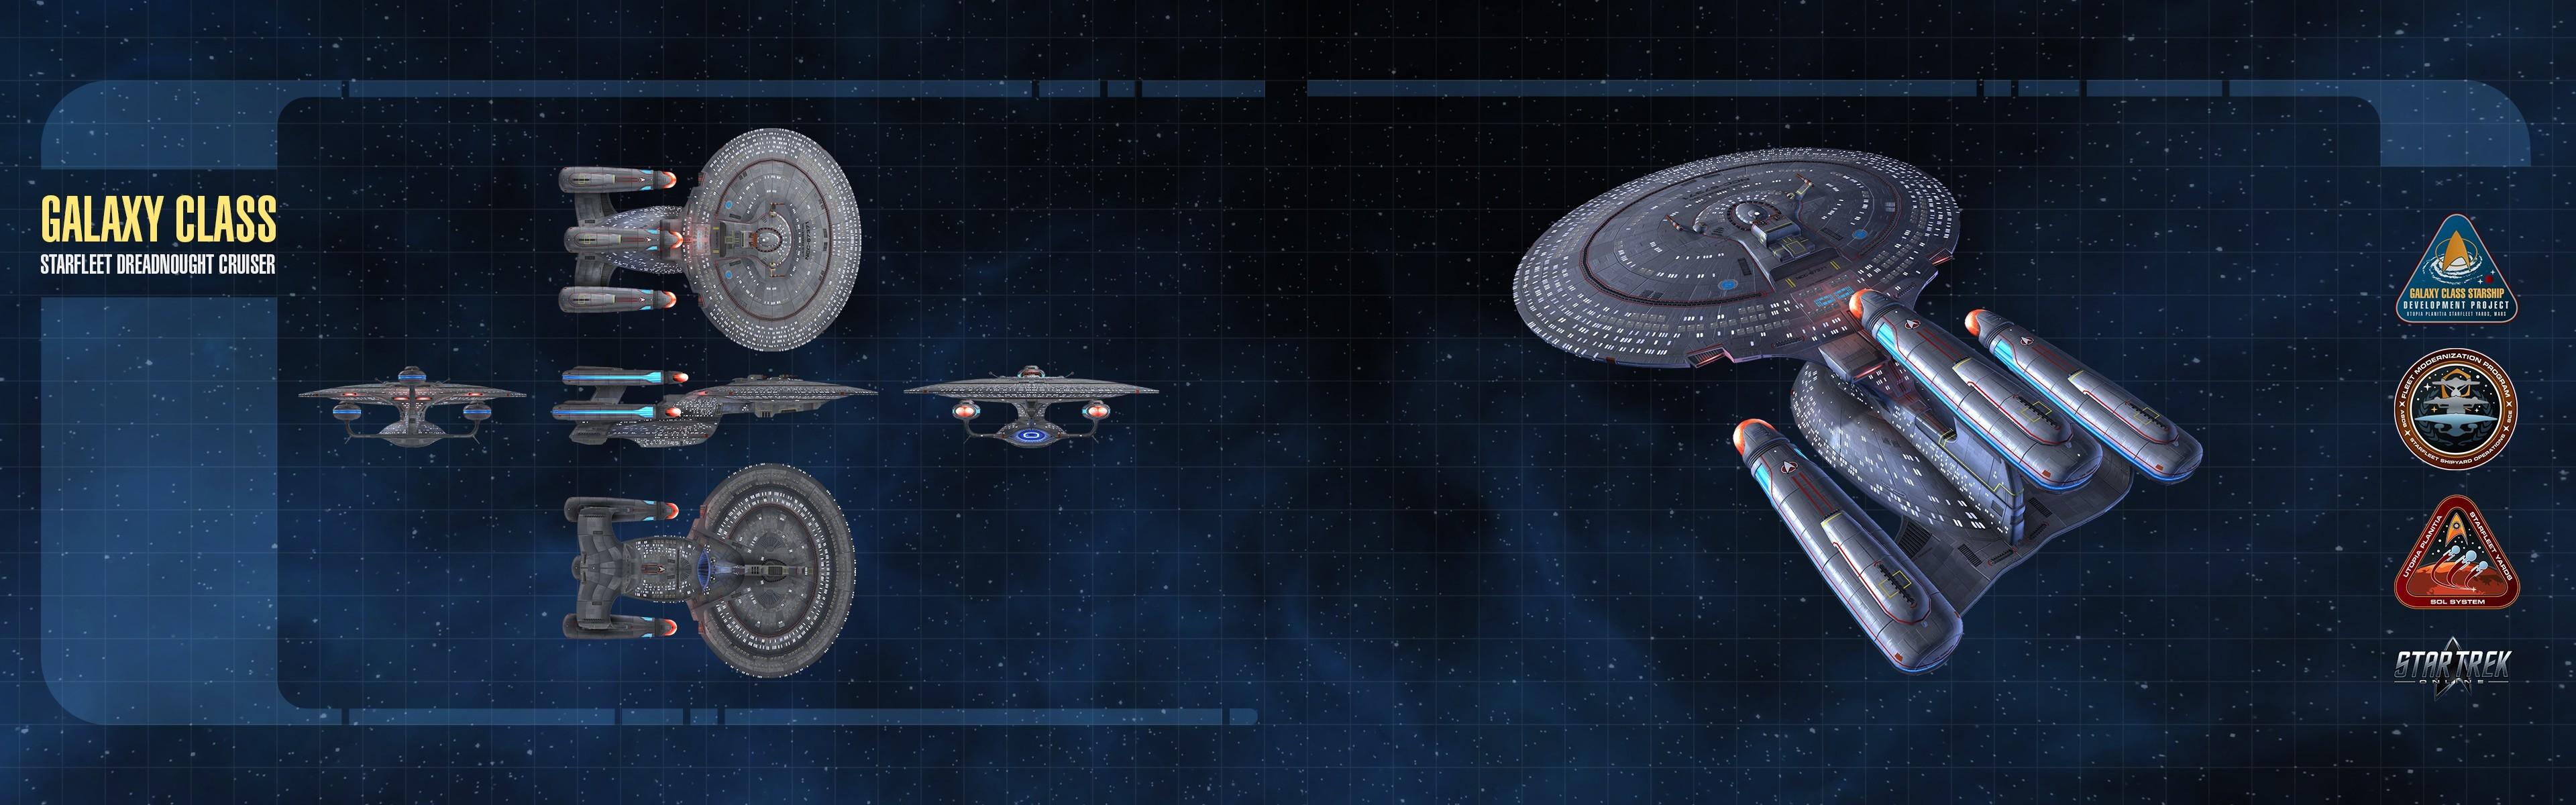 General Star Trek spaceship multiple display dual monitors